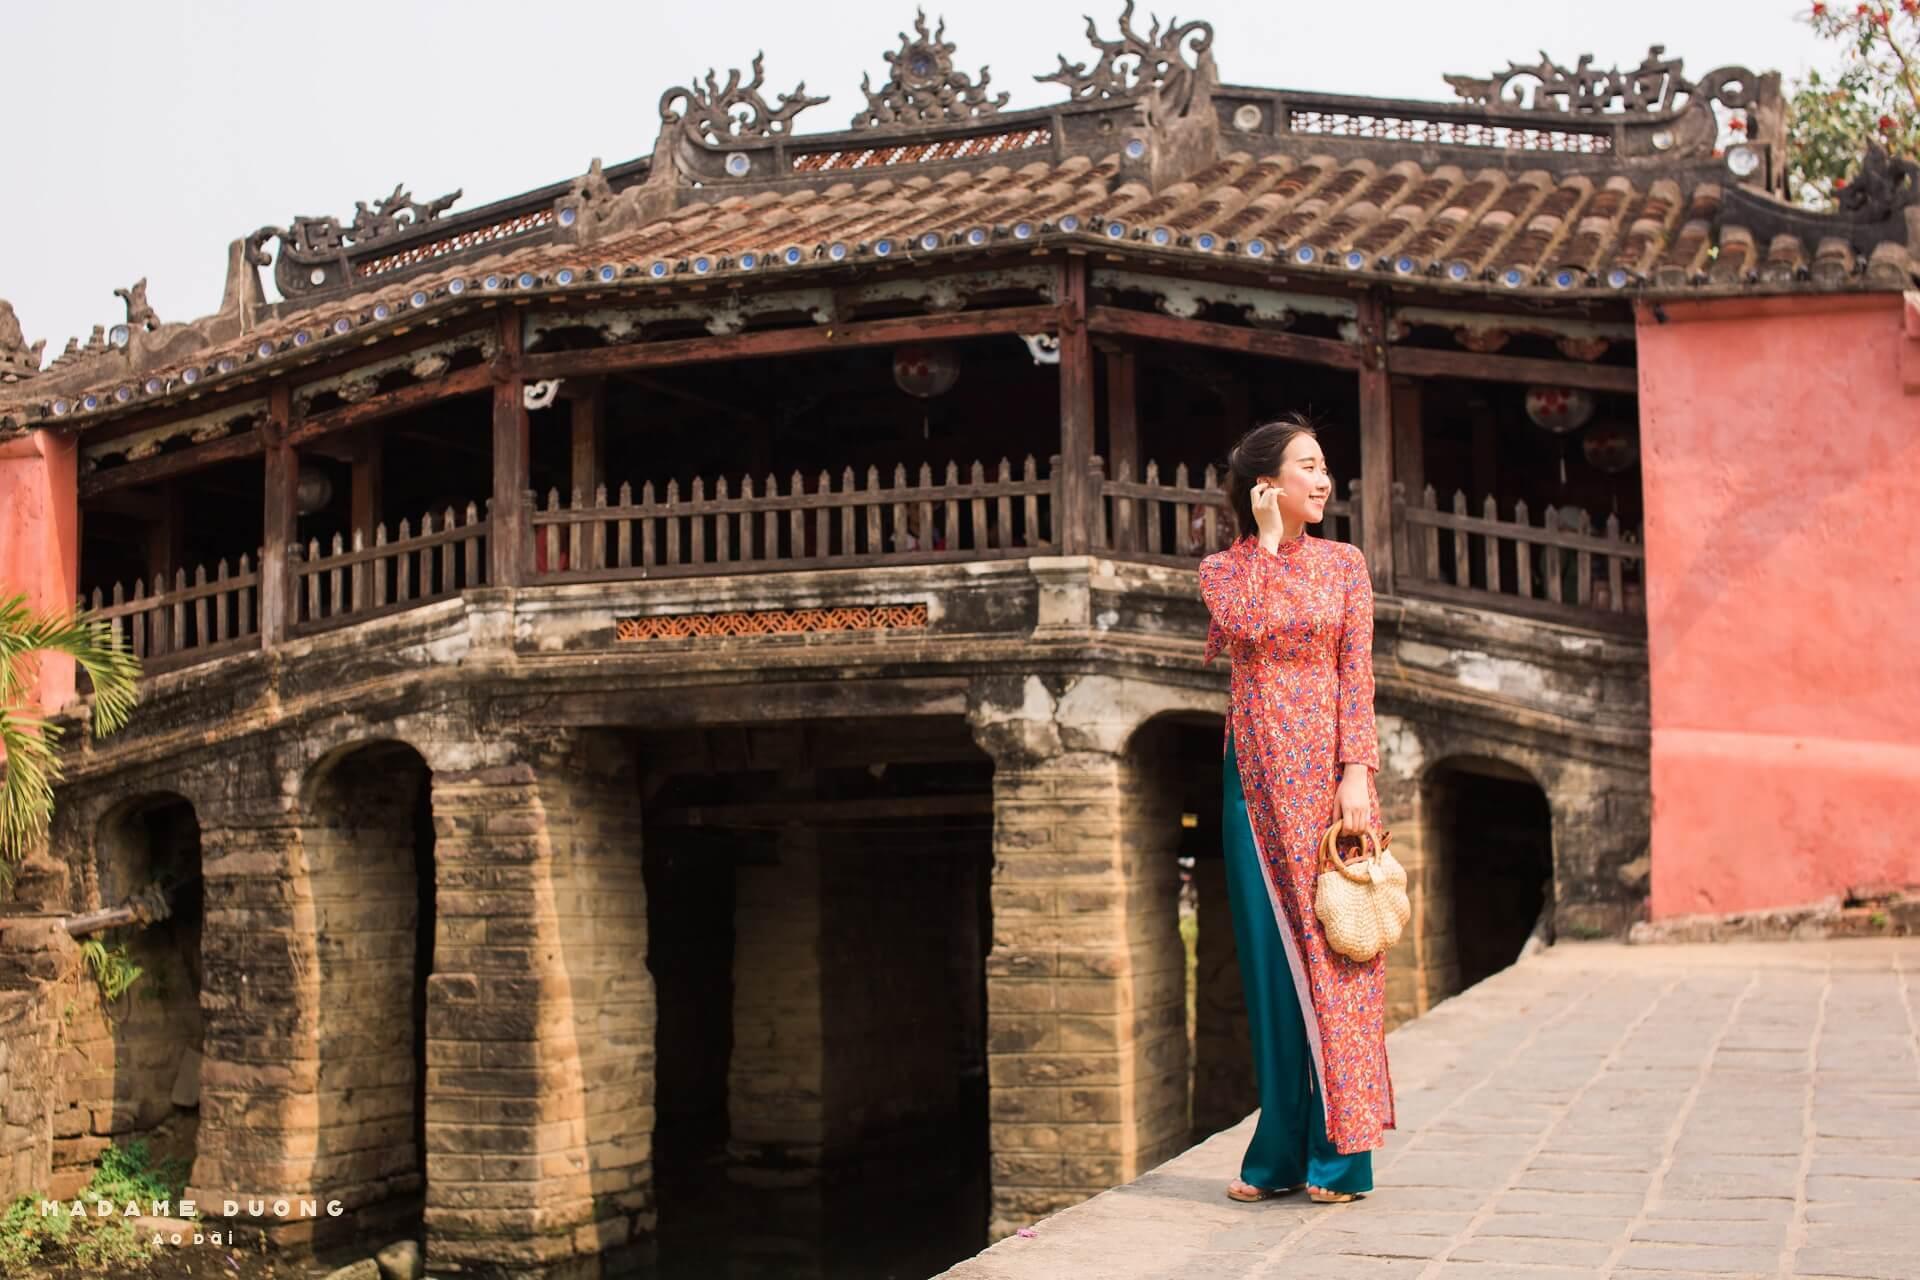 Ao Dai Madame Duong 36 Nguyen Thai Hoc Danang Fantasticity Com05